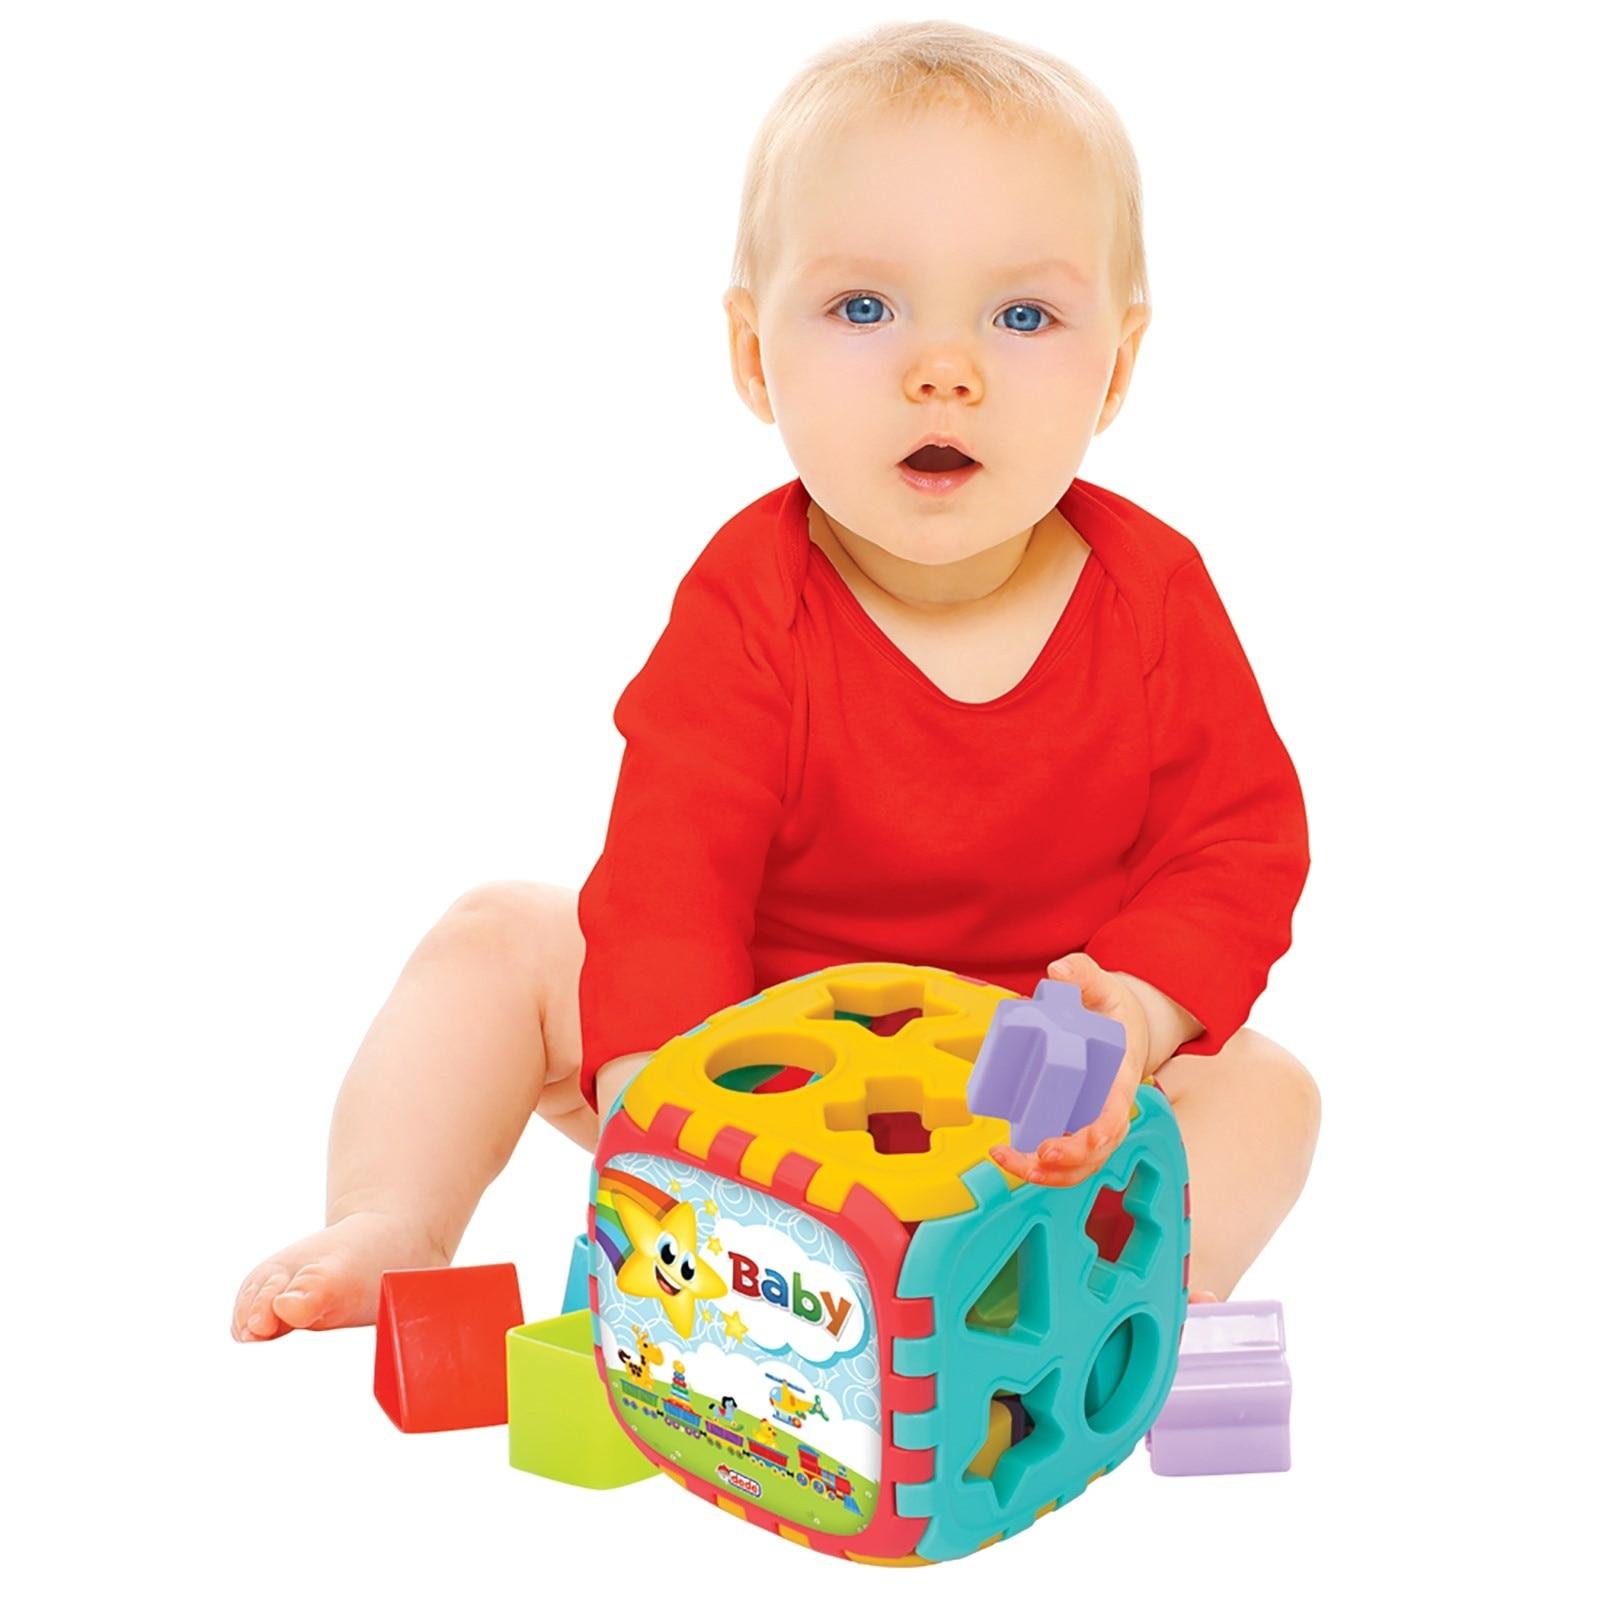 Ebebek Fen Oyuncak Baby Puzzle Big Shape Sorter Cube